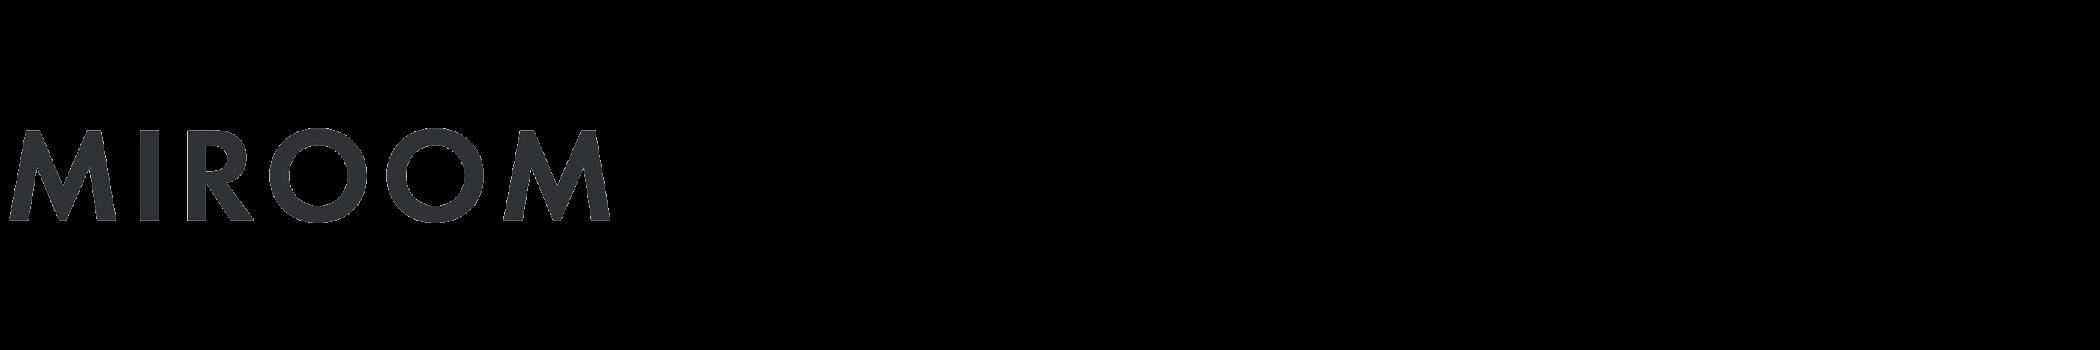 Top service logo zh cn